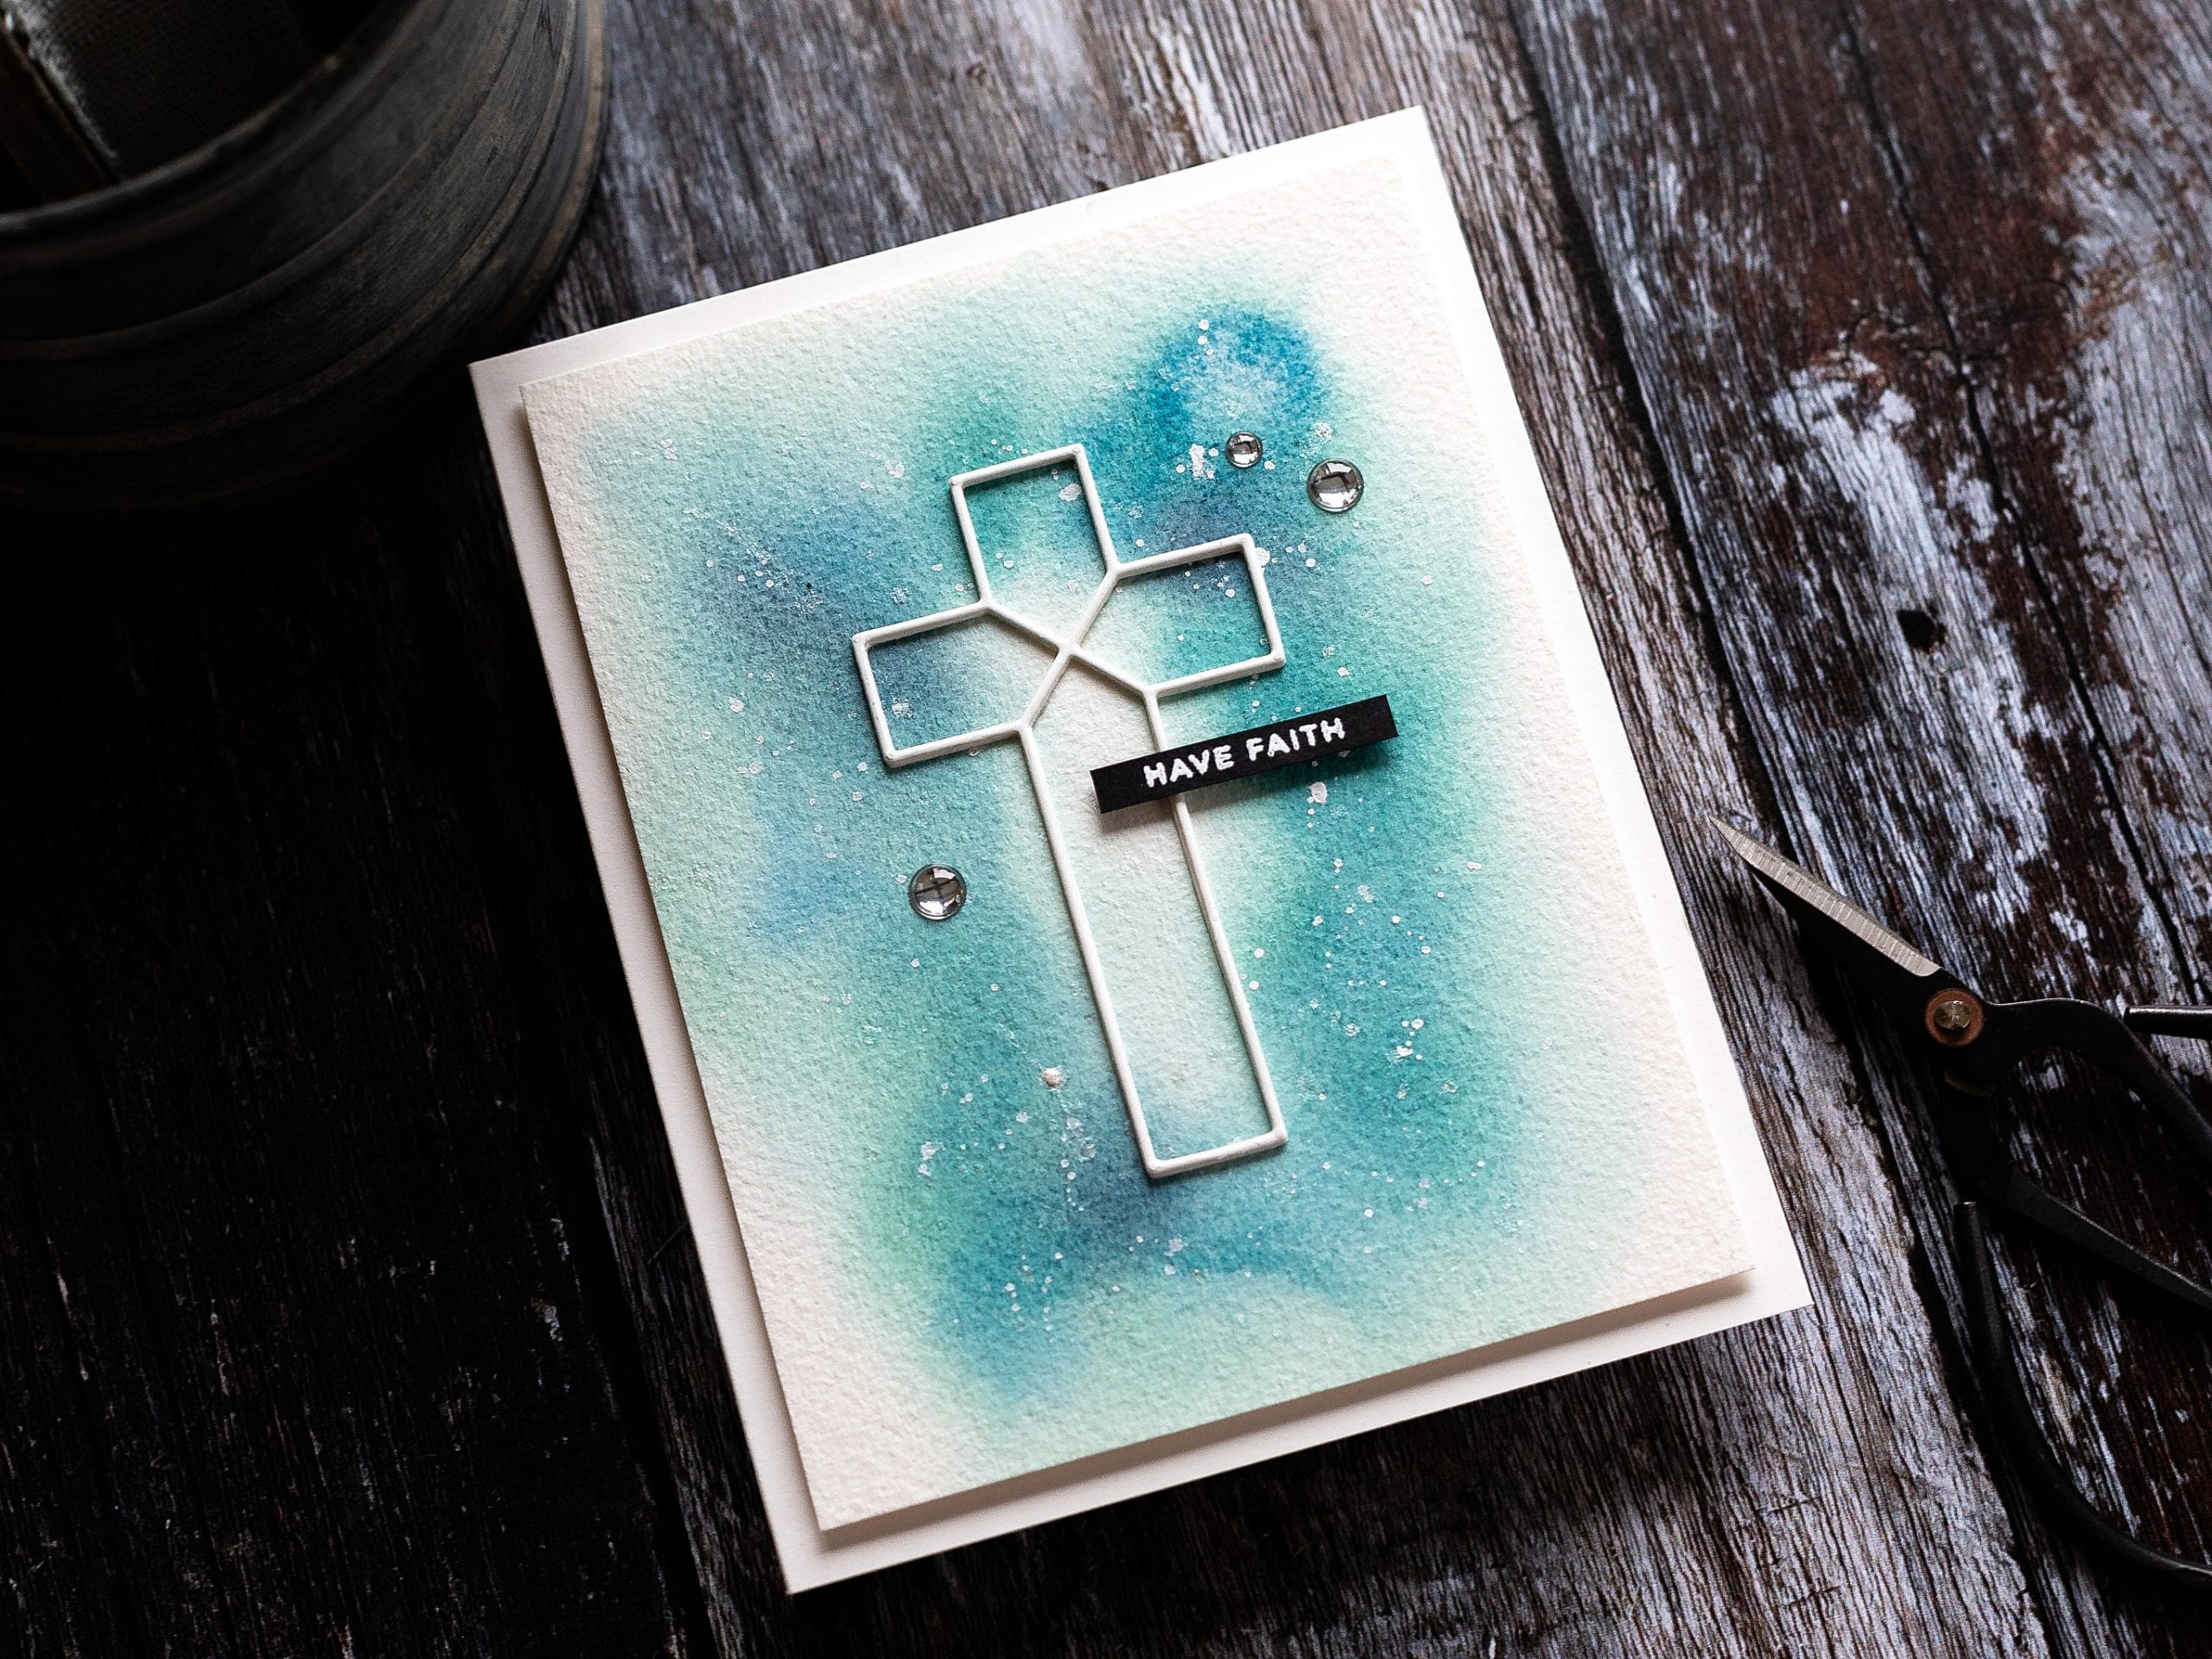 Simplicity Speaks Volumes + New Simon Release